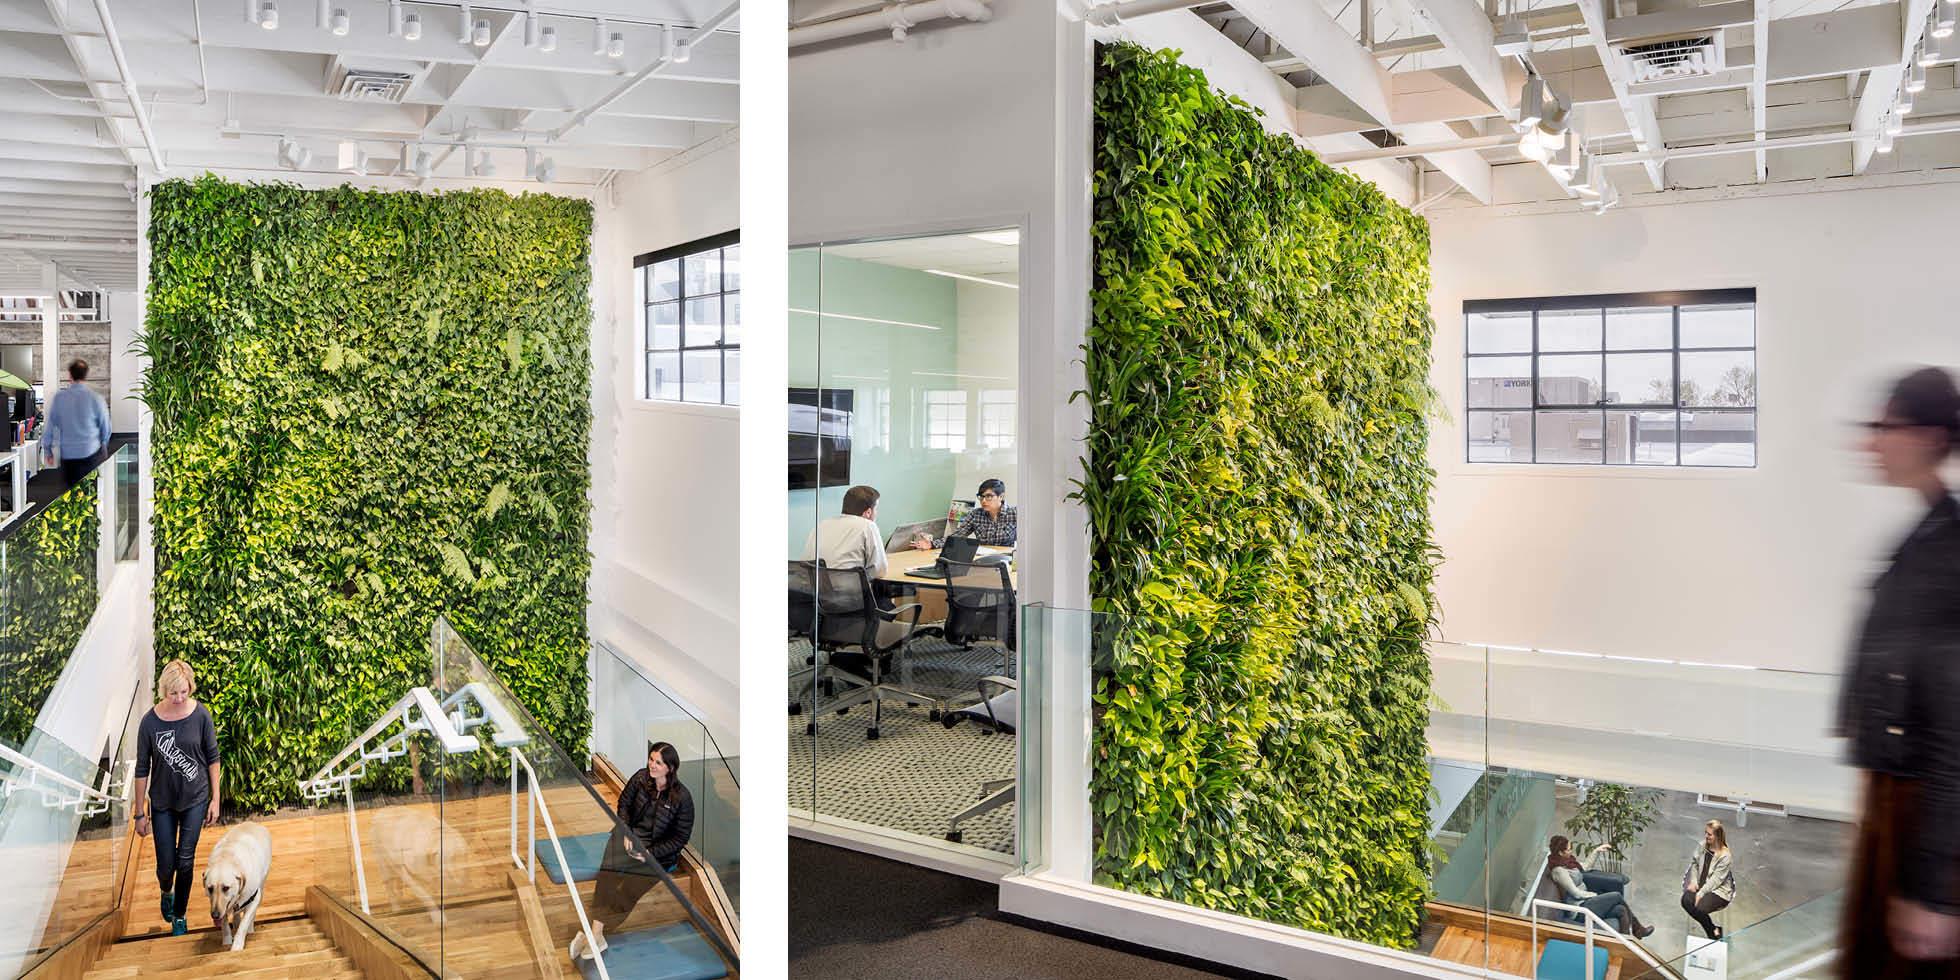 Plum Organics Living Wall by Habitat Horticulture - View 1